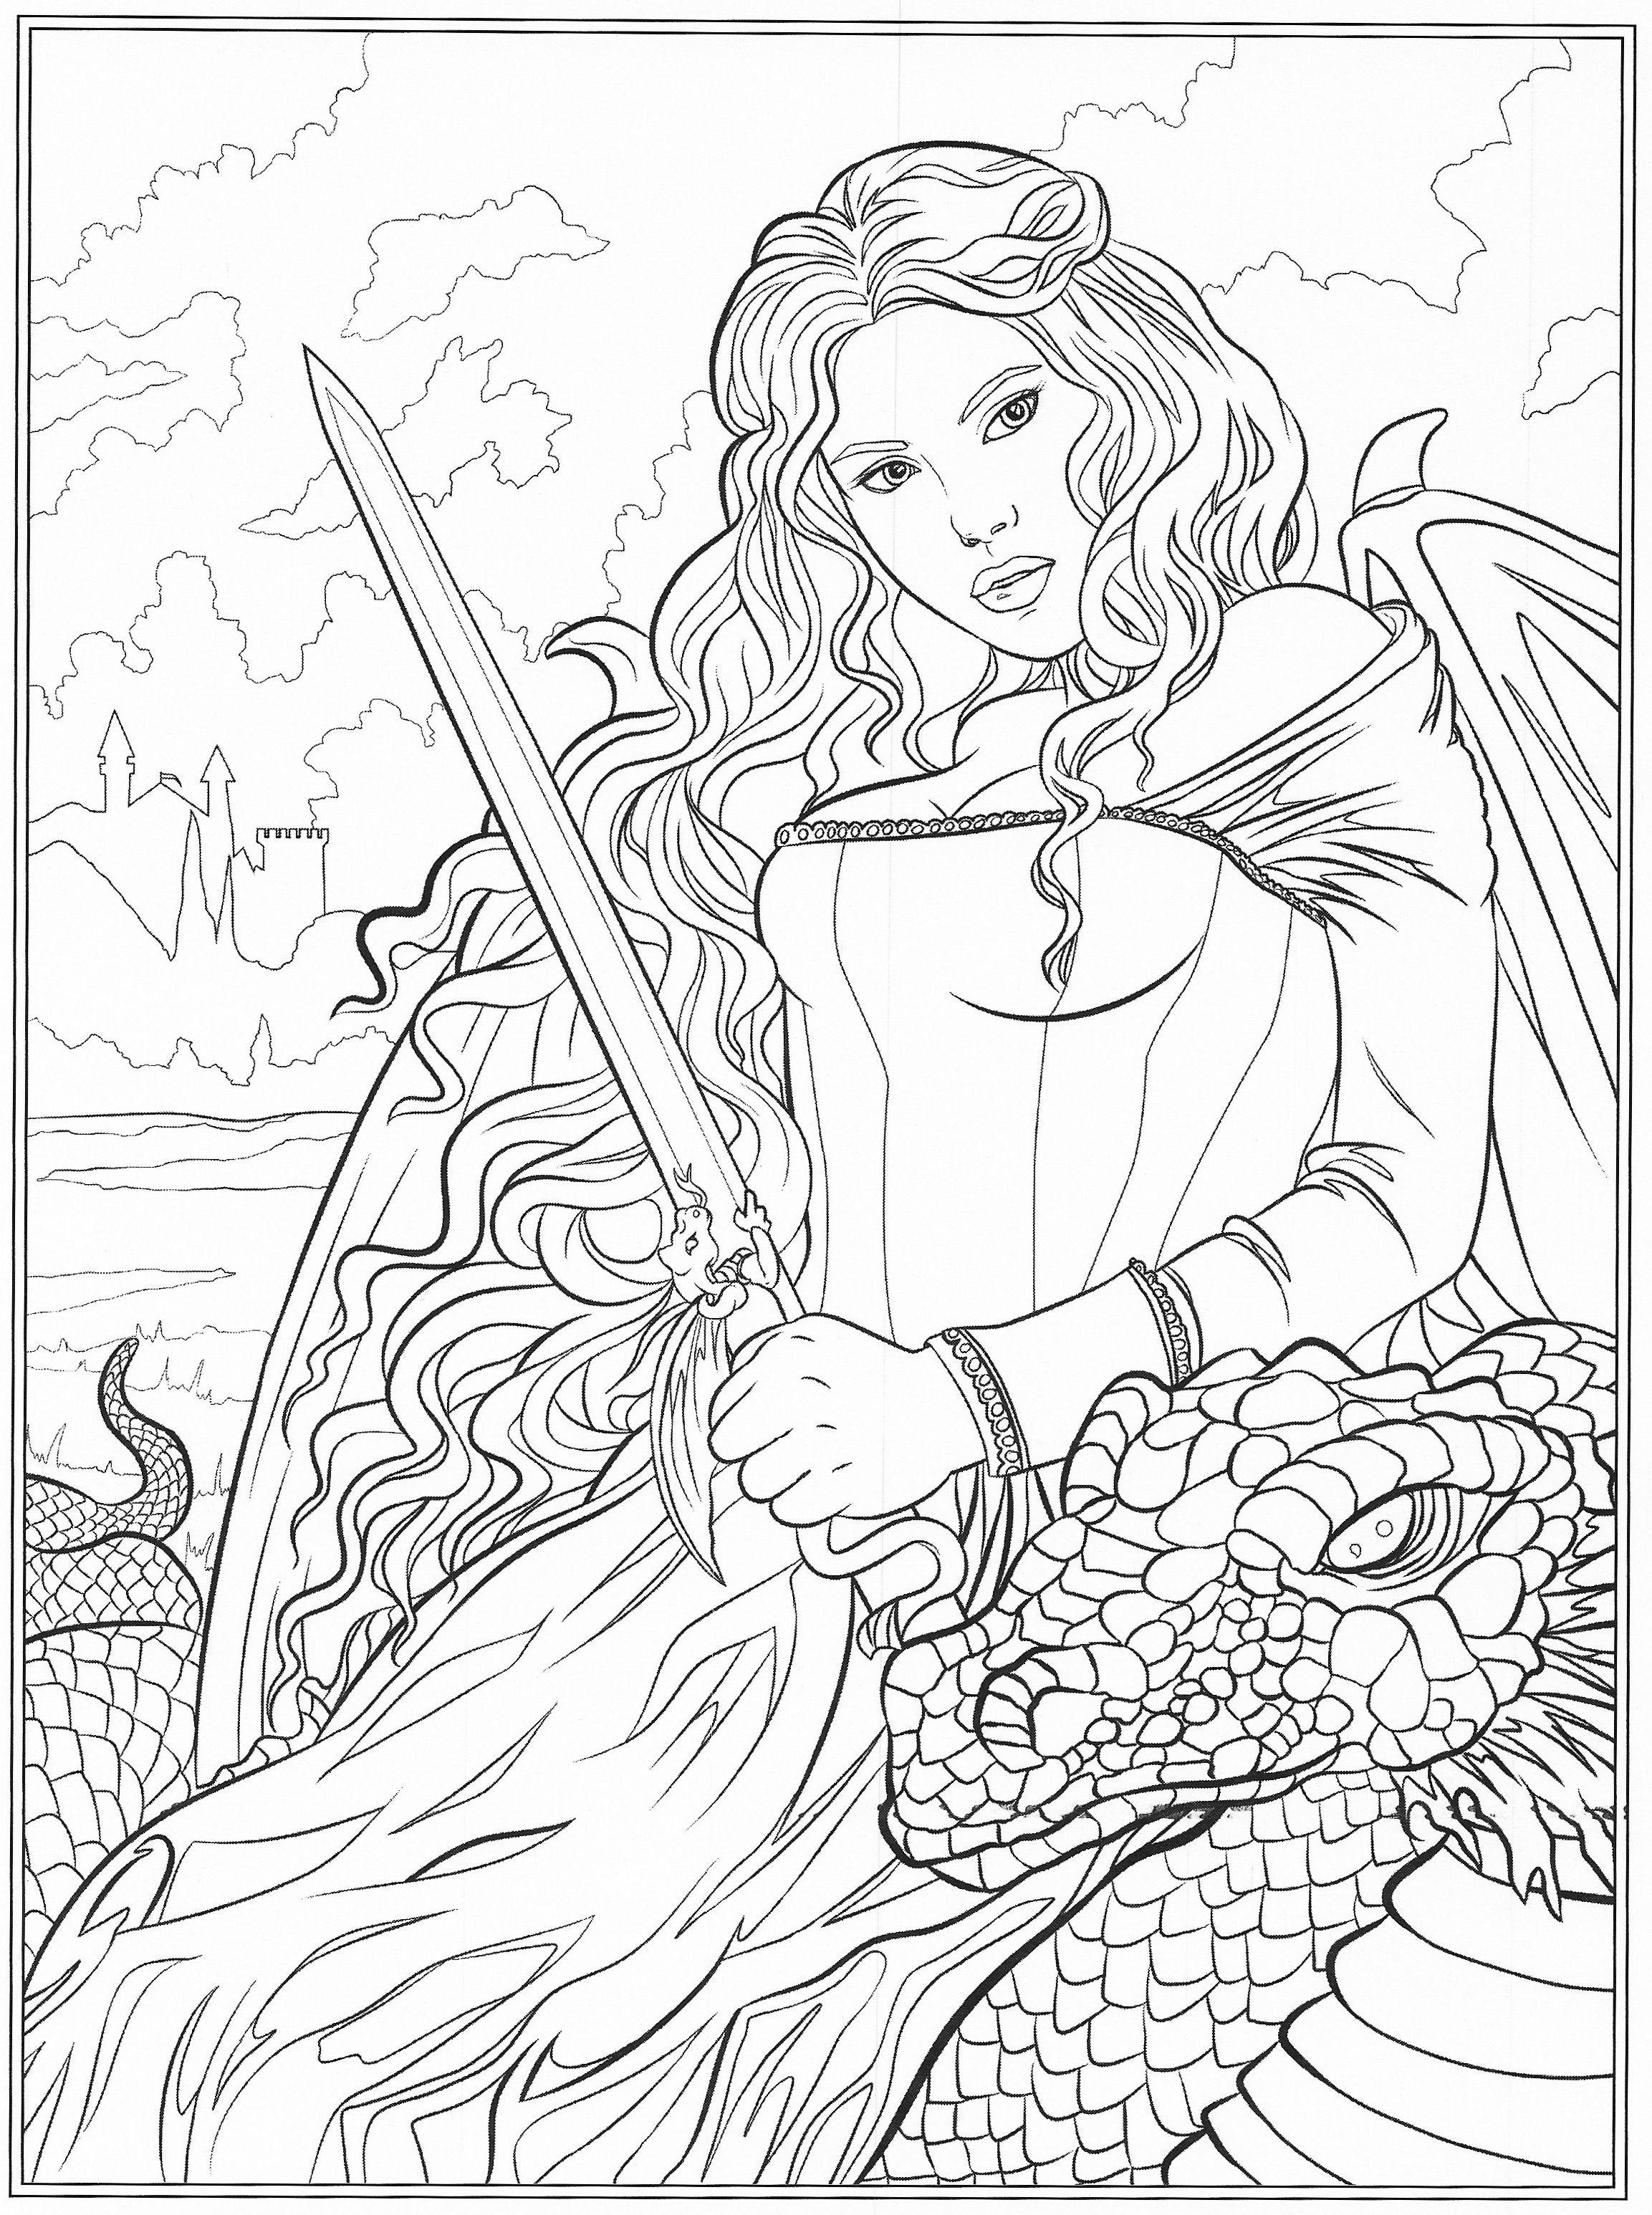 Gothic Dark Dark Fantasy Coloring Pages - NECRAZYSTAMPERCOM